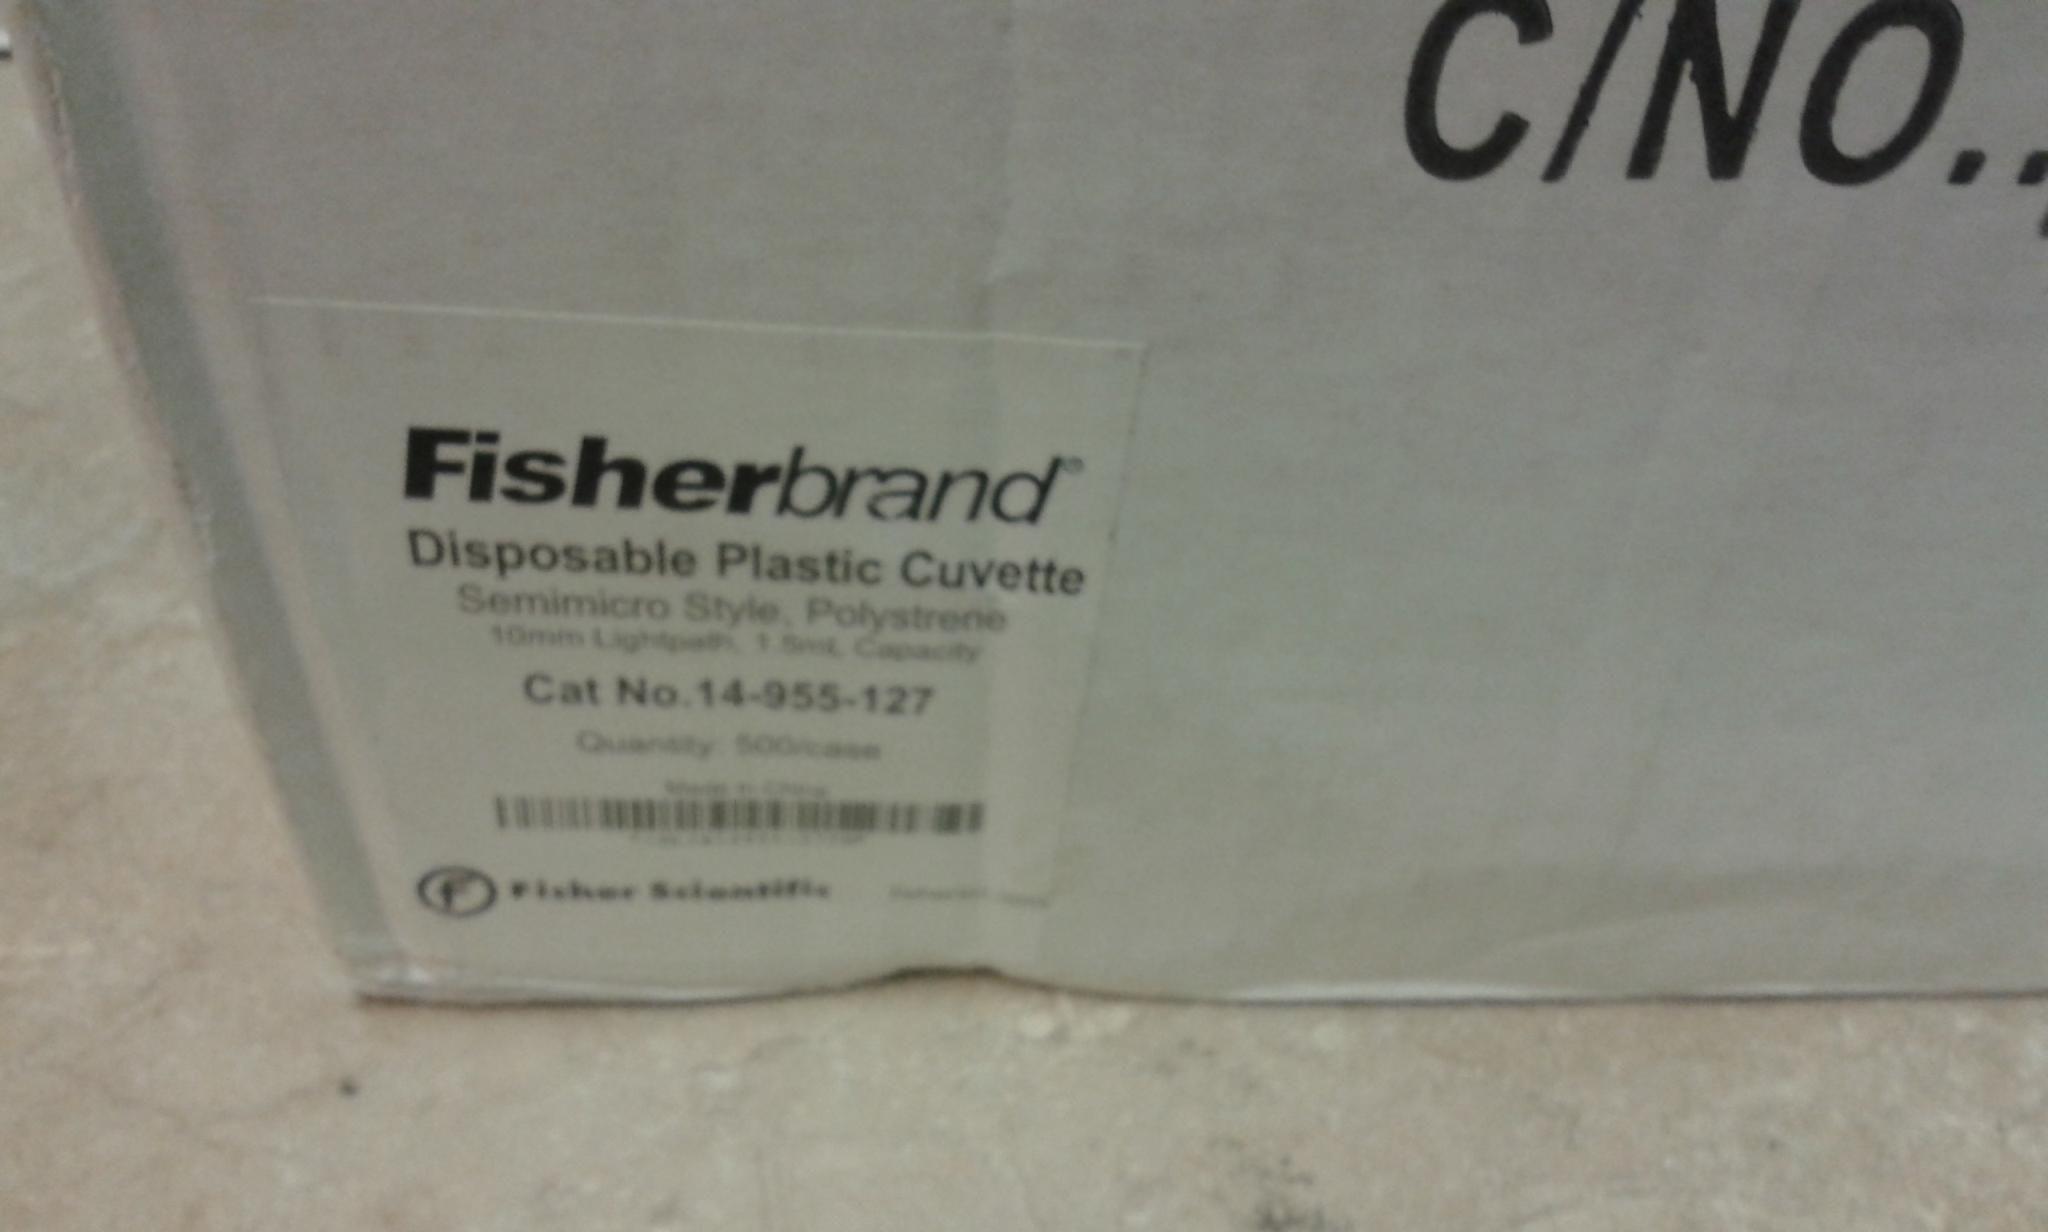 Fisherbrand disposable semi-micro Cuvette,500/case,10mm lightpath,1.5ml capacity,